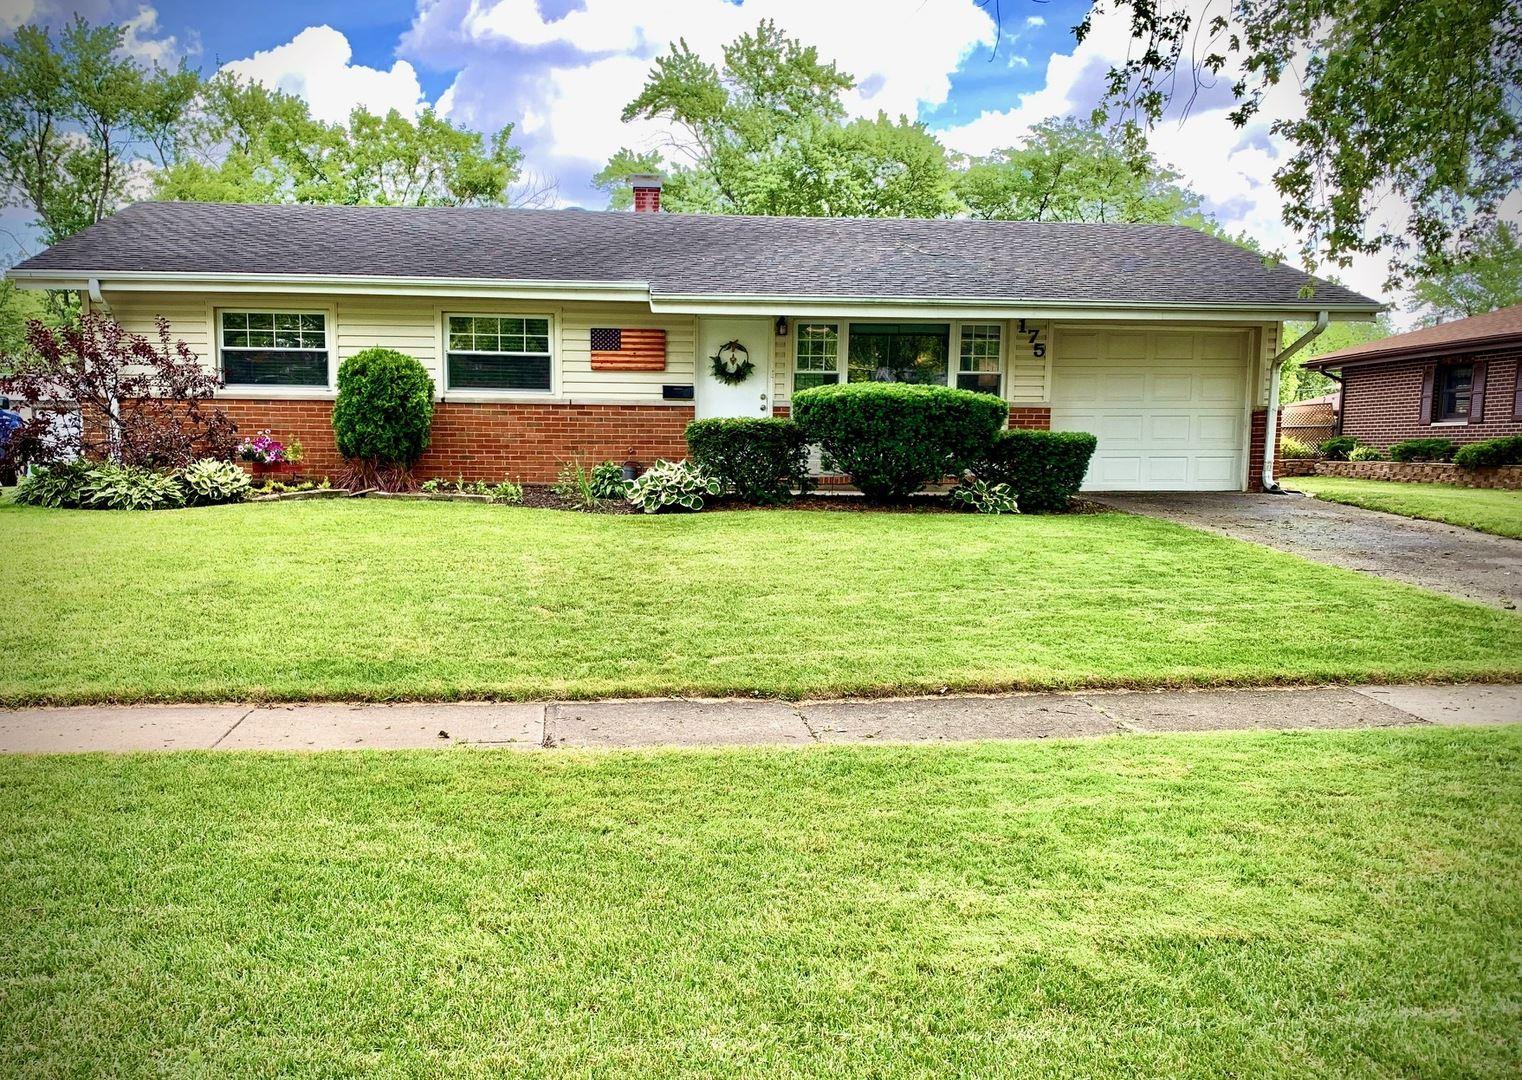 175 Washington Boulevard, Hoffman Estates, IL 60169 - #: 10766067